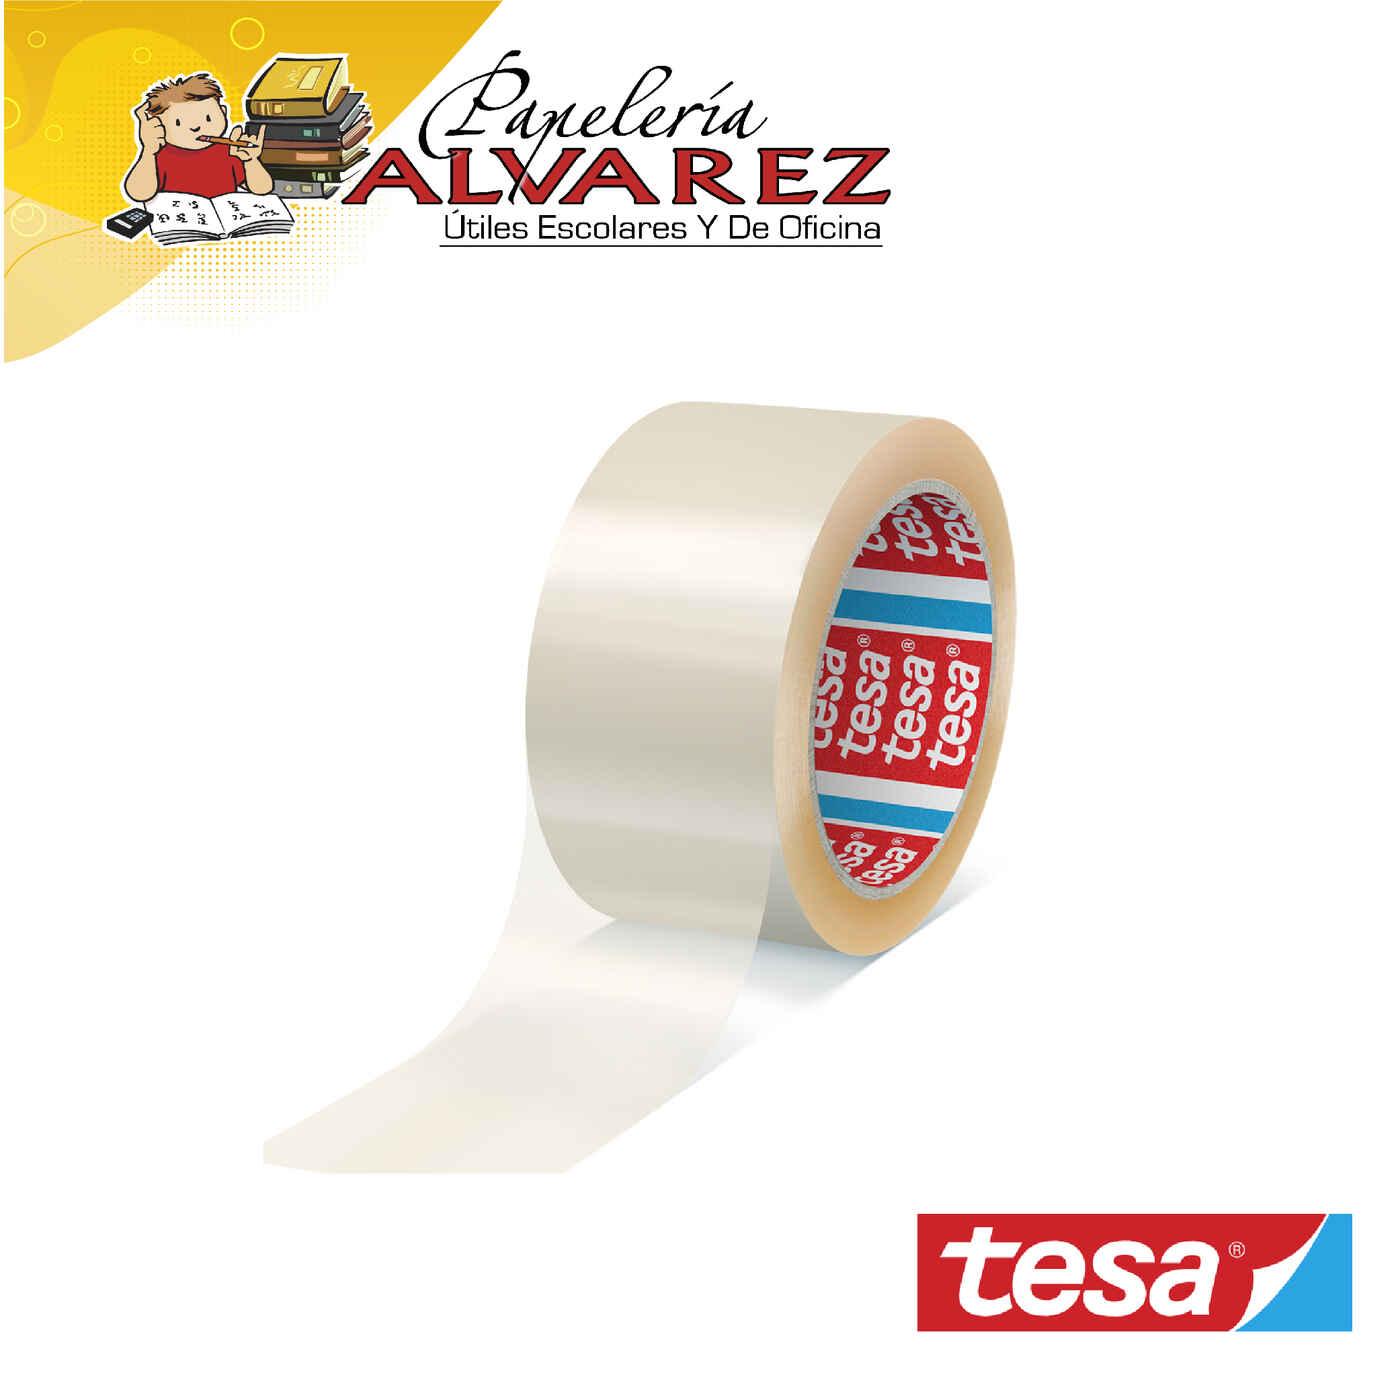 CINTA EMPAQUE TESA 48 X 100 MTS (2